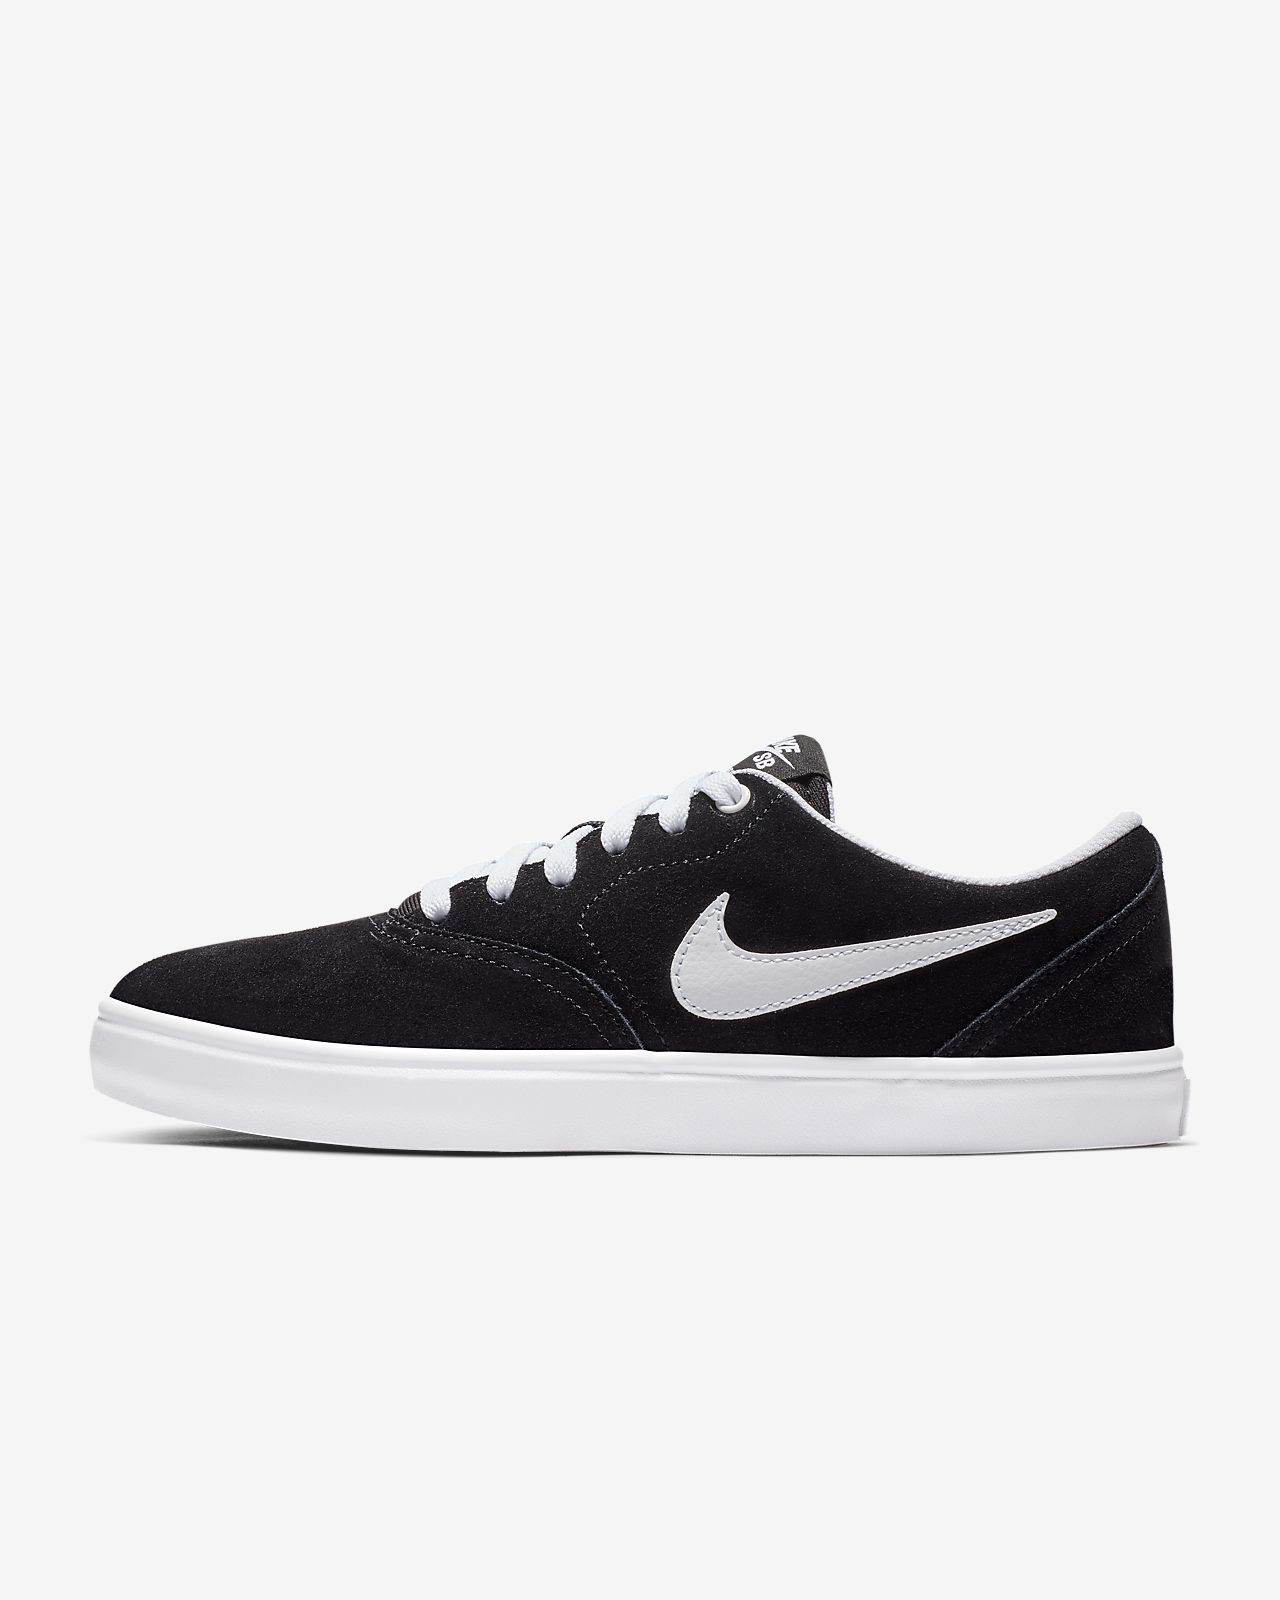 new styles 664d1 49456 ... Nike SB Check Solarsoft Zapatillas de skateboard para mujer